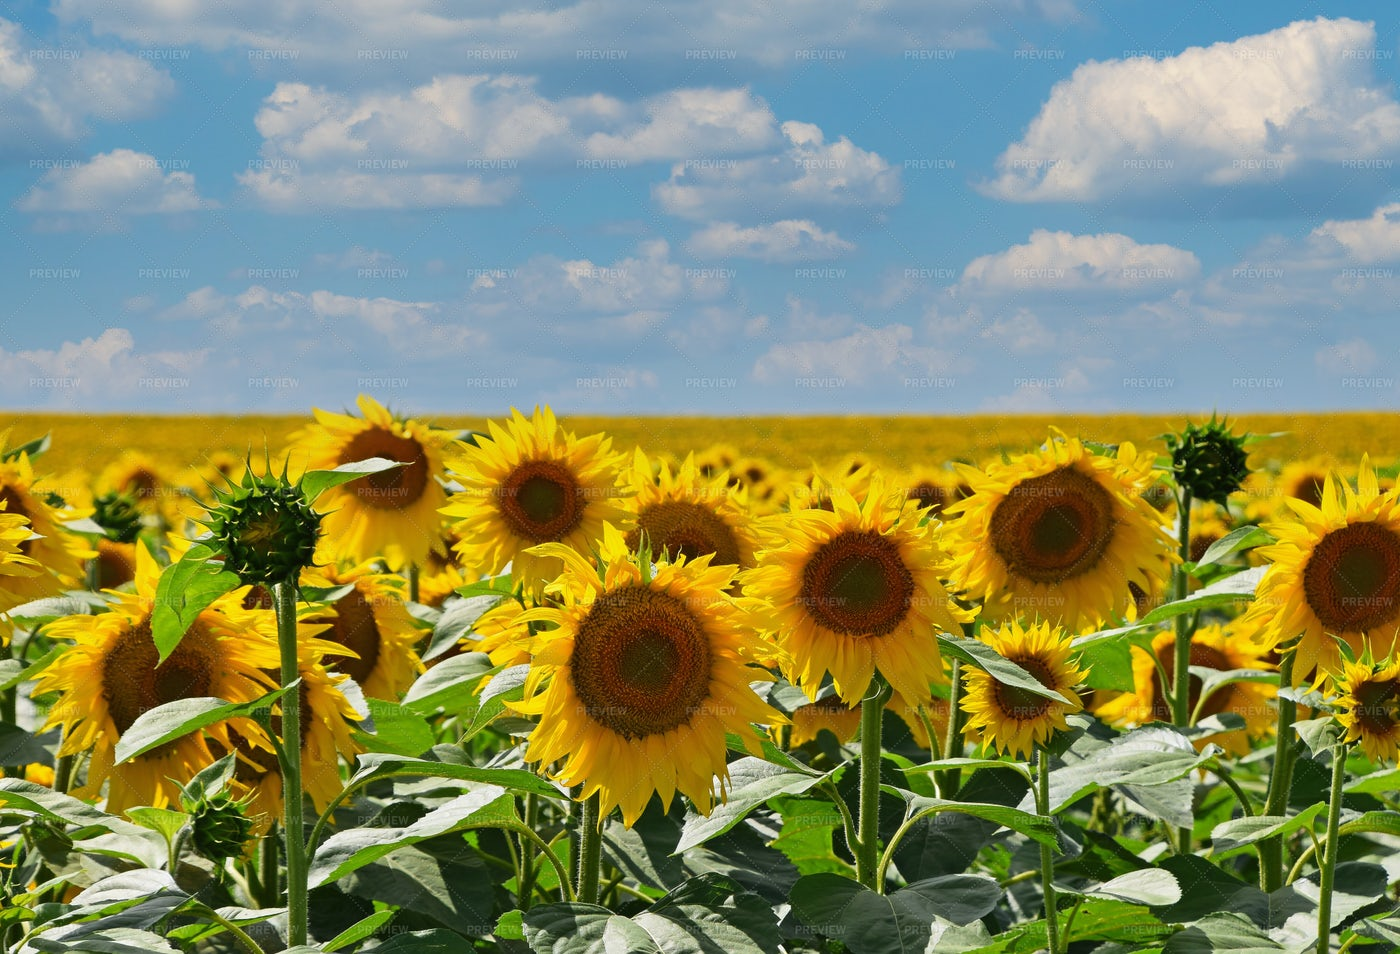 Field Of Yellow Sunflowers: Stock Photos